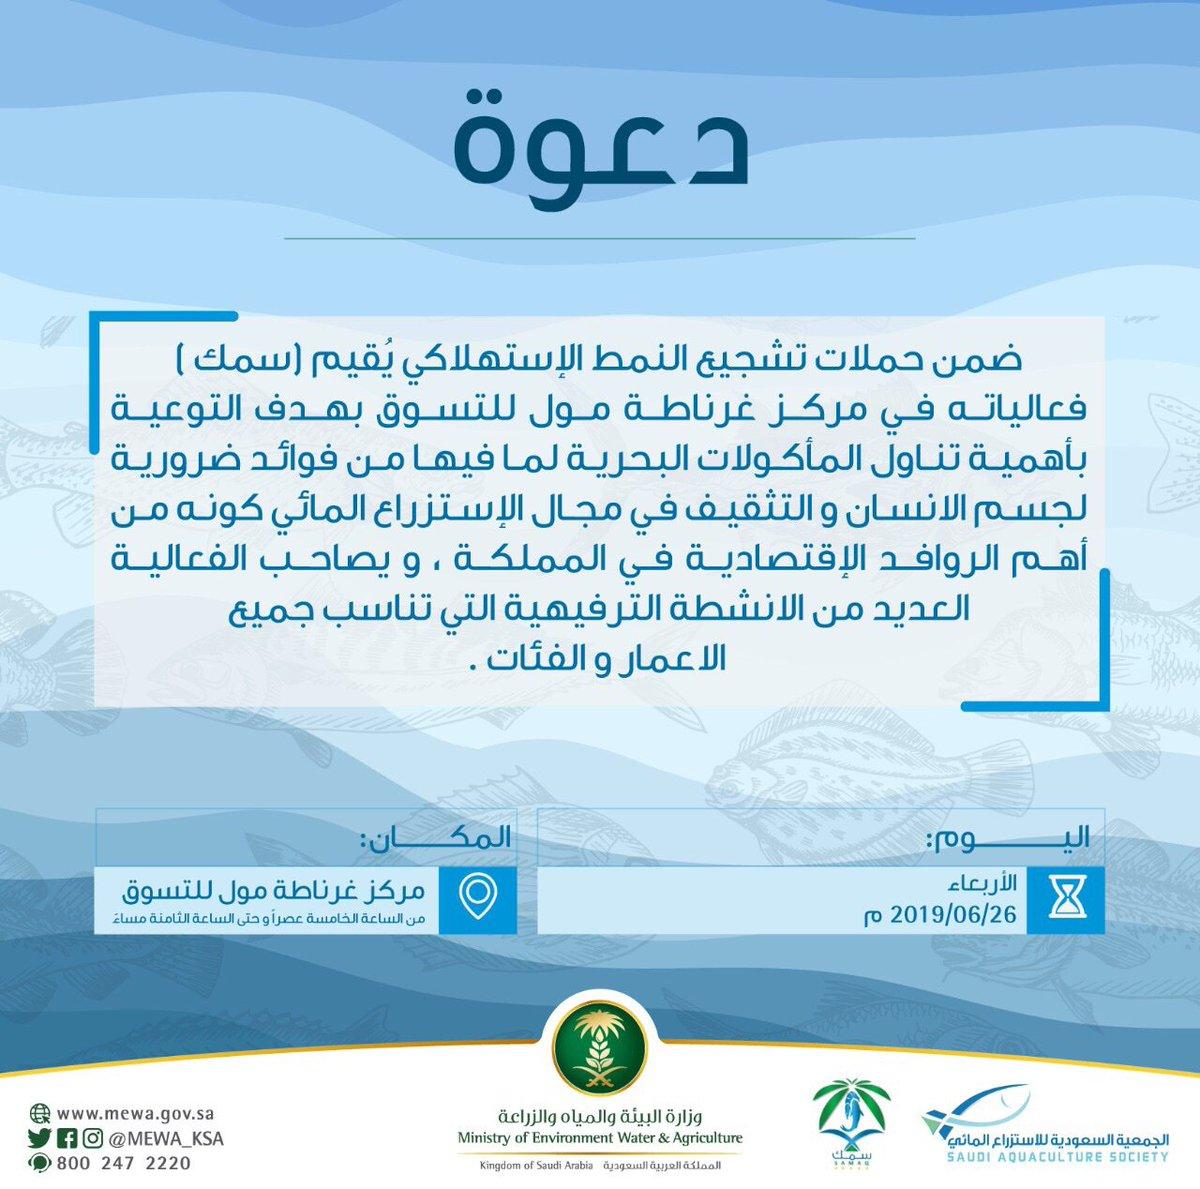 fdf810f99 وزارة البيئة والمياه والزراعةVerified account @MEWA_KSA